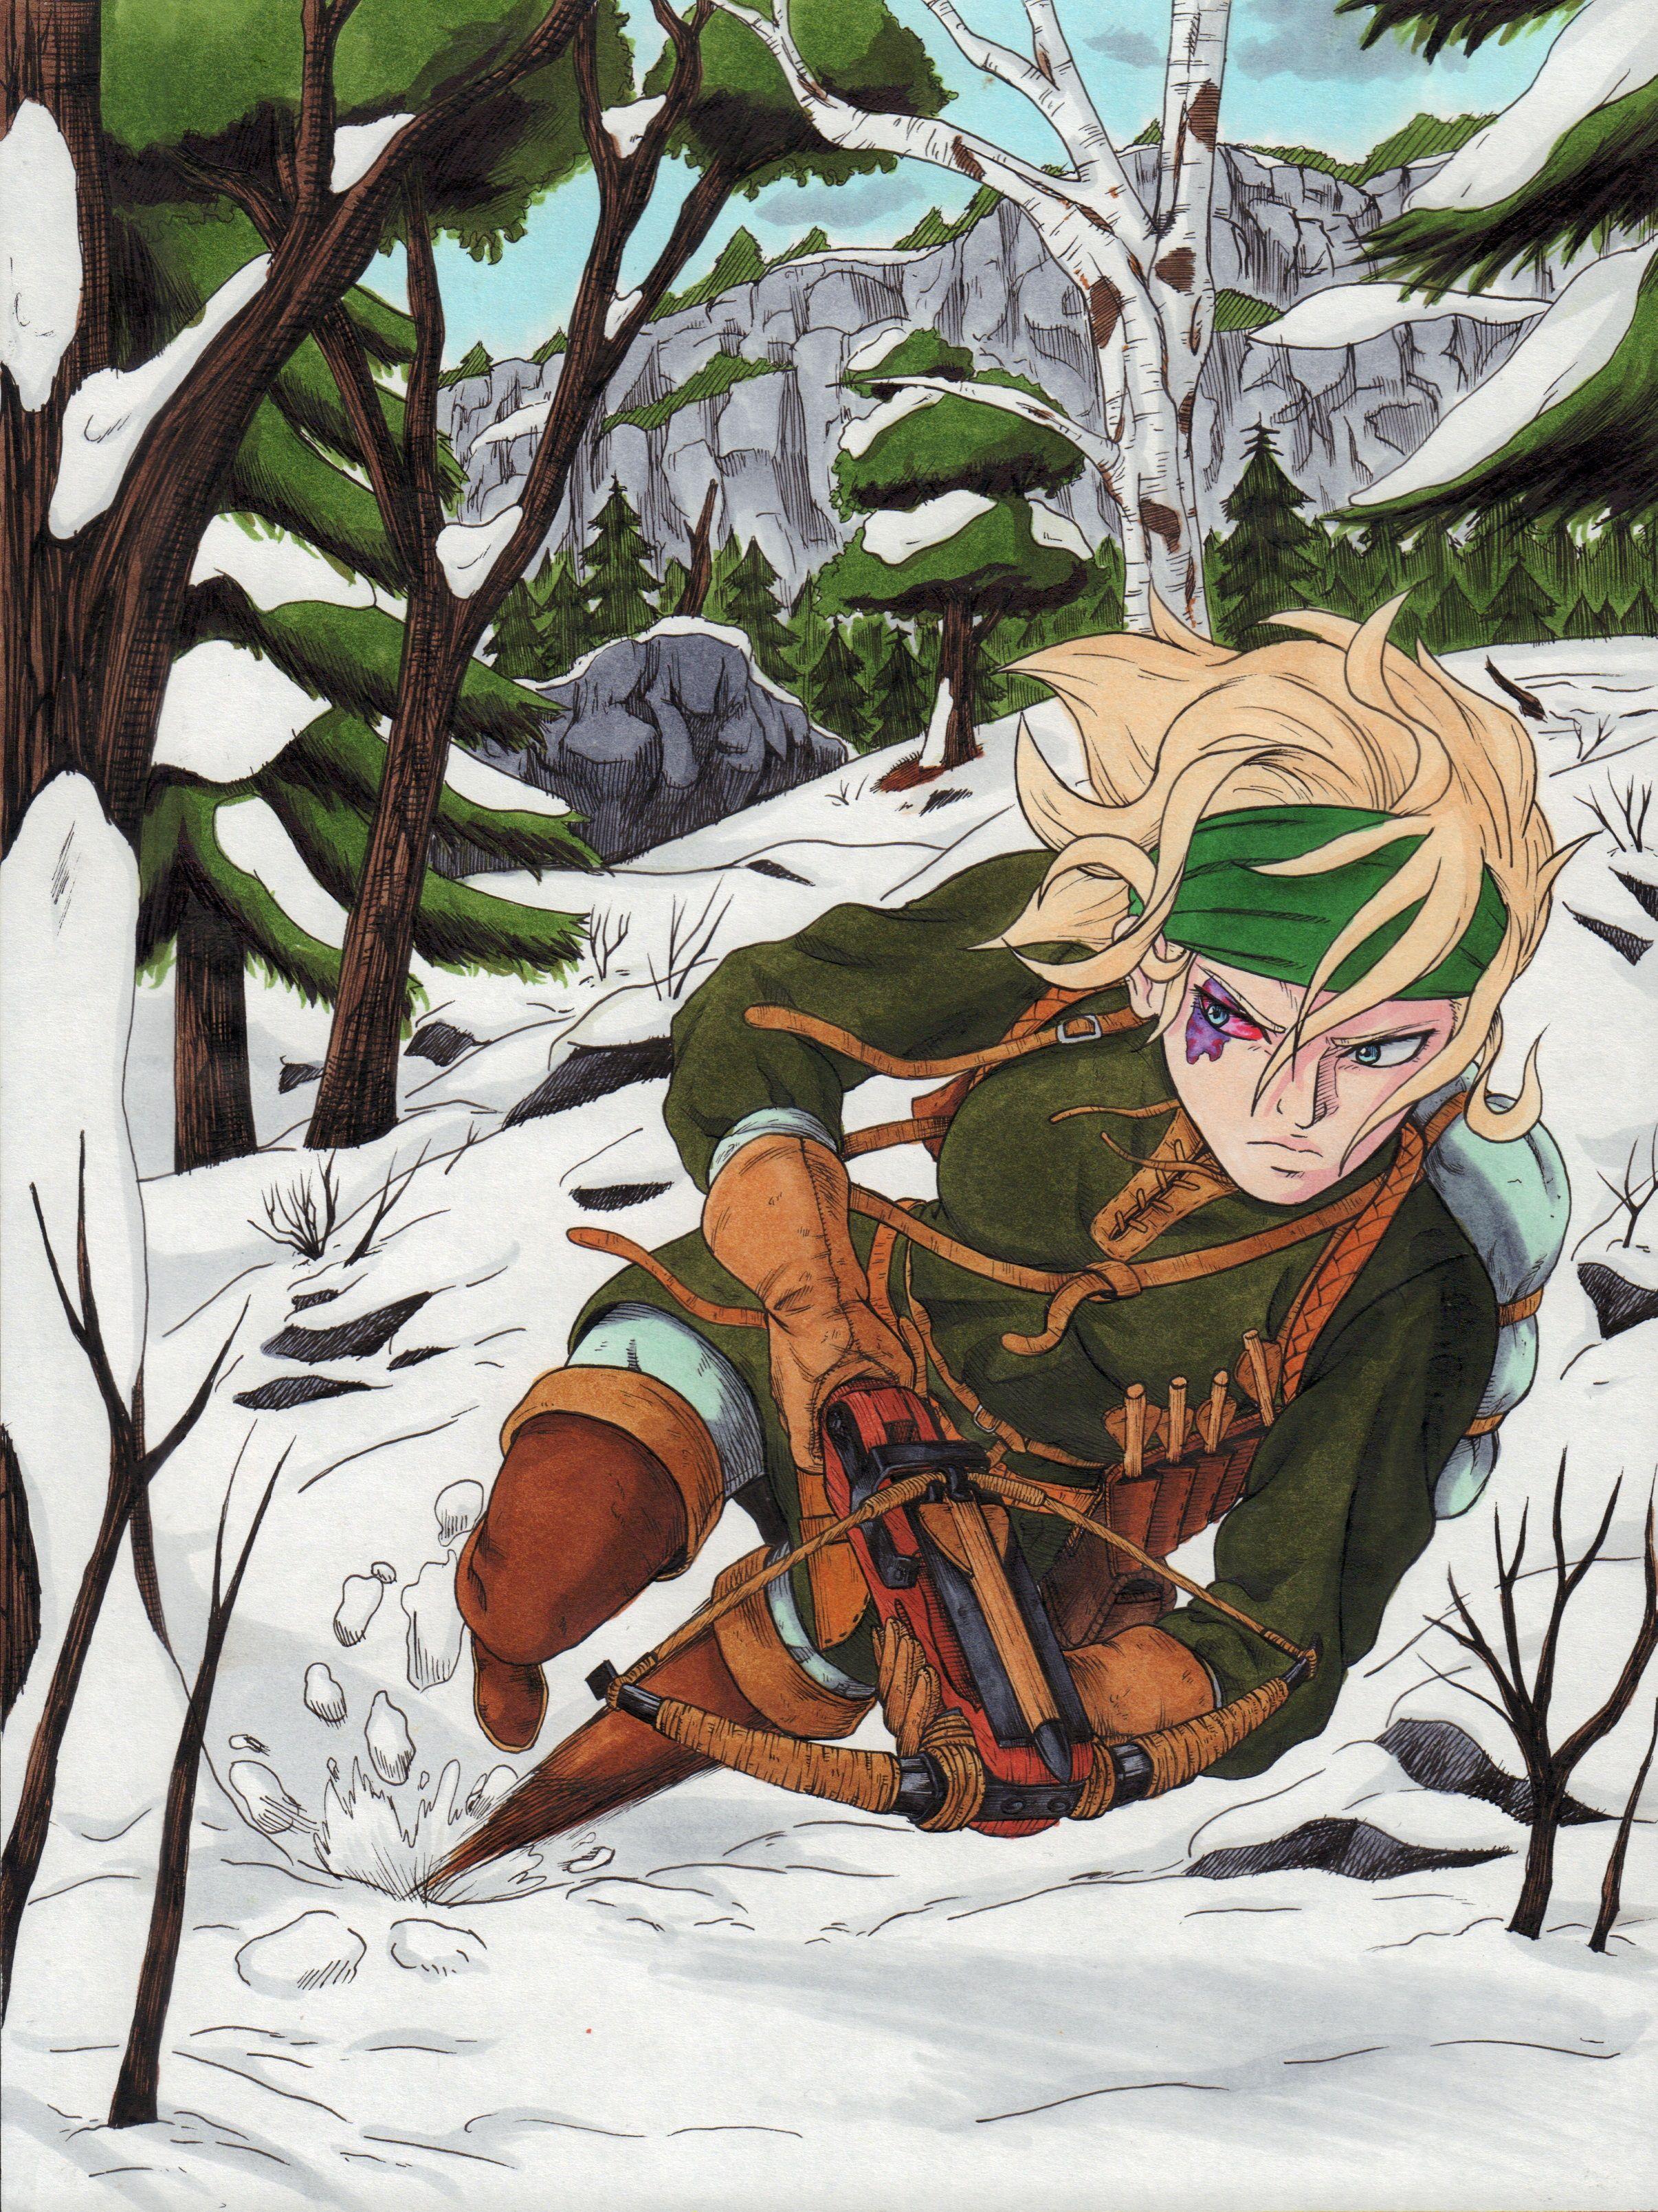 Pin by Sweetchin on Сага о Винланде in 2020 Anime